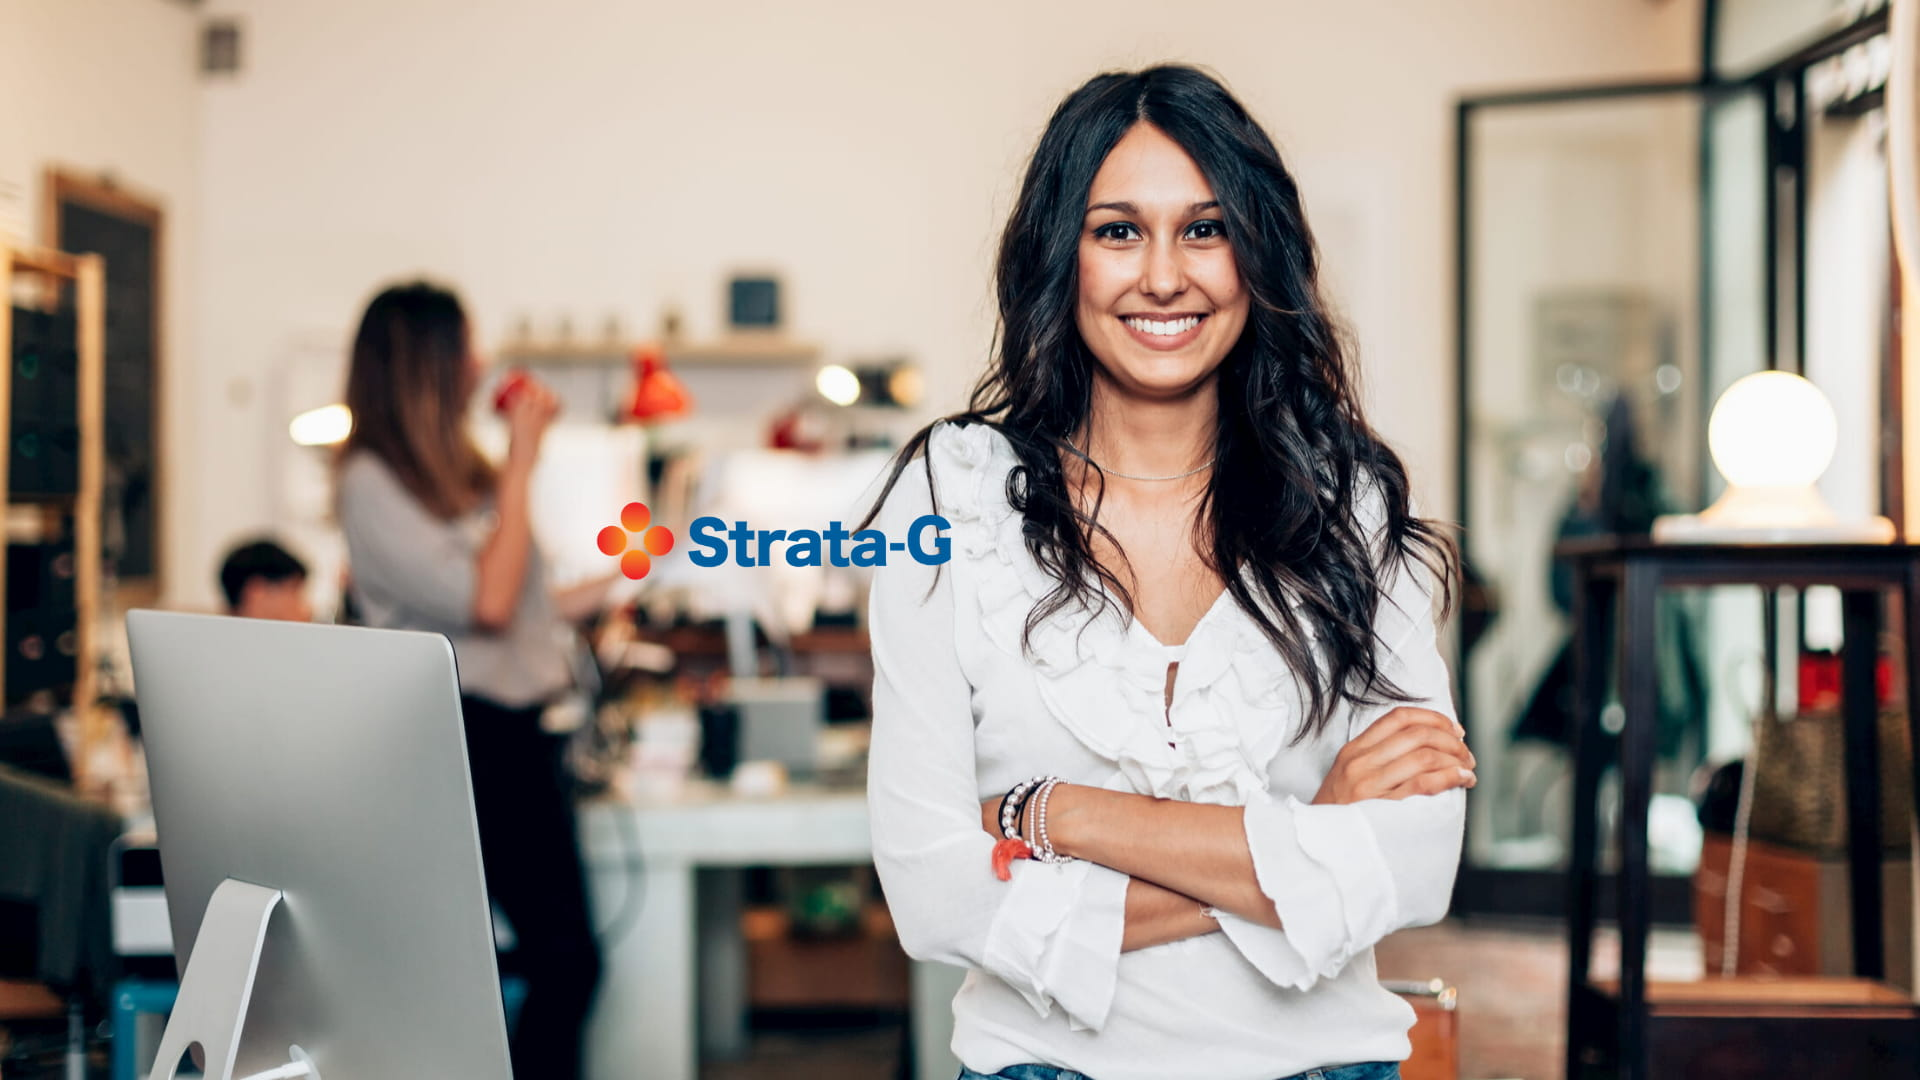 Strata-G Virtual Accountants in Canada